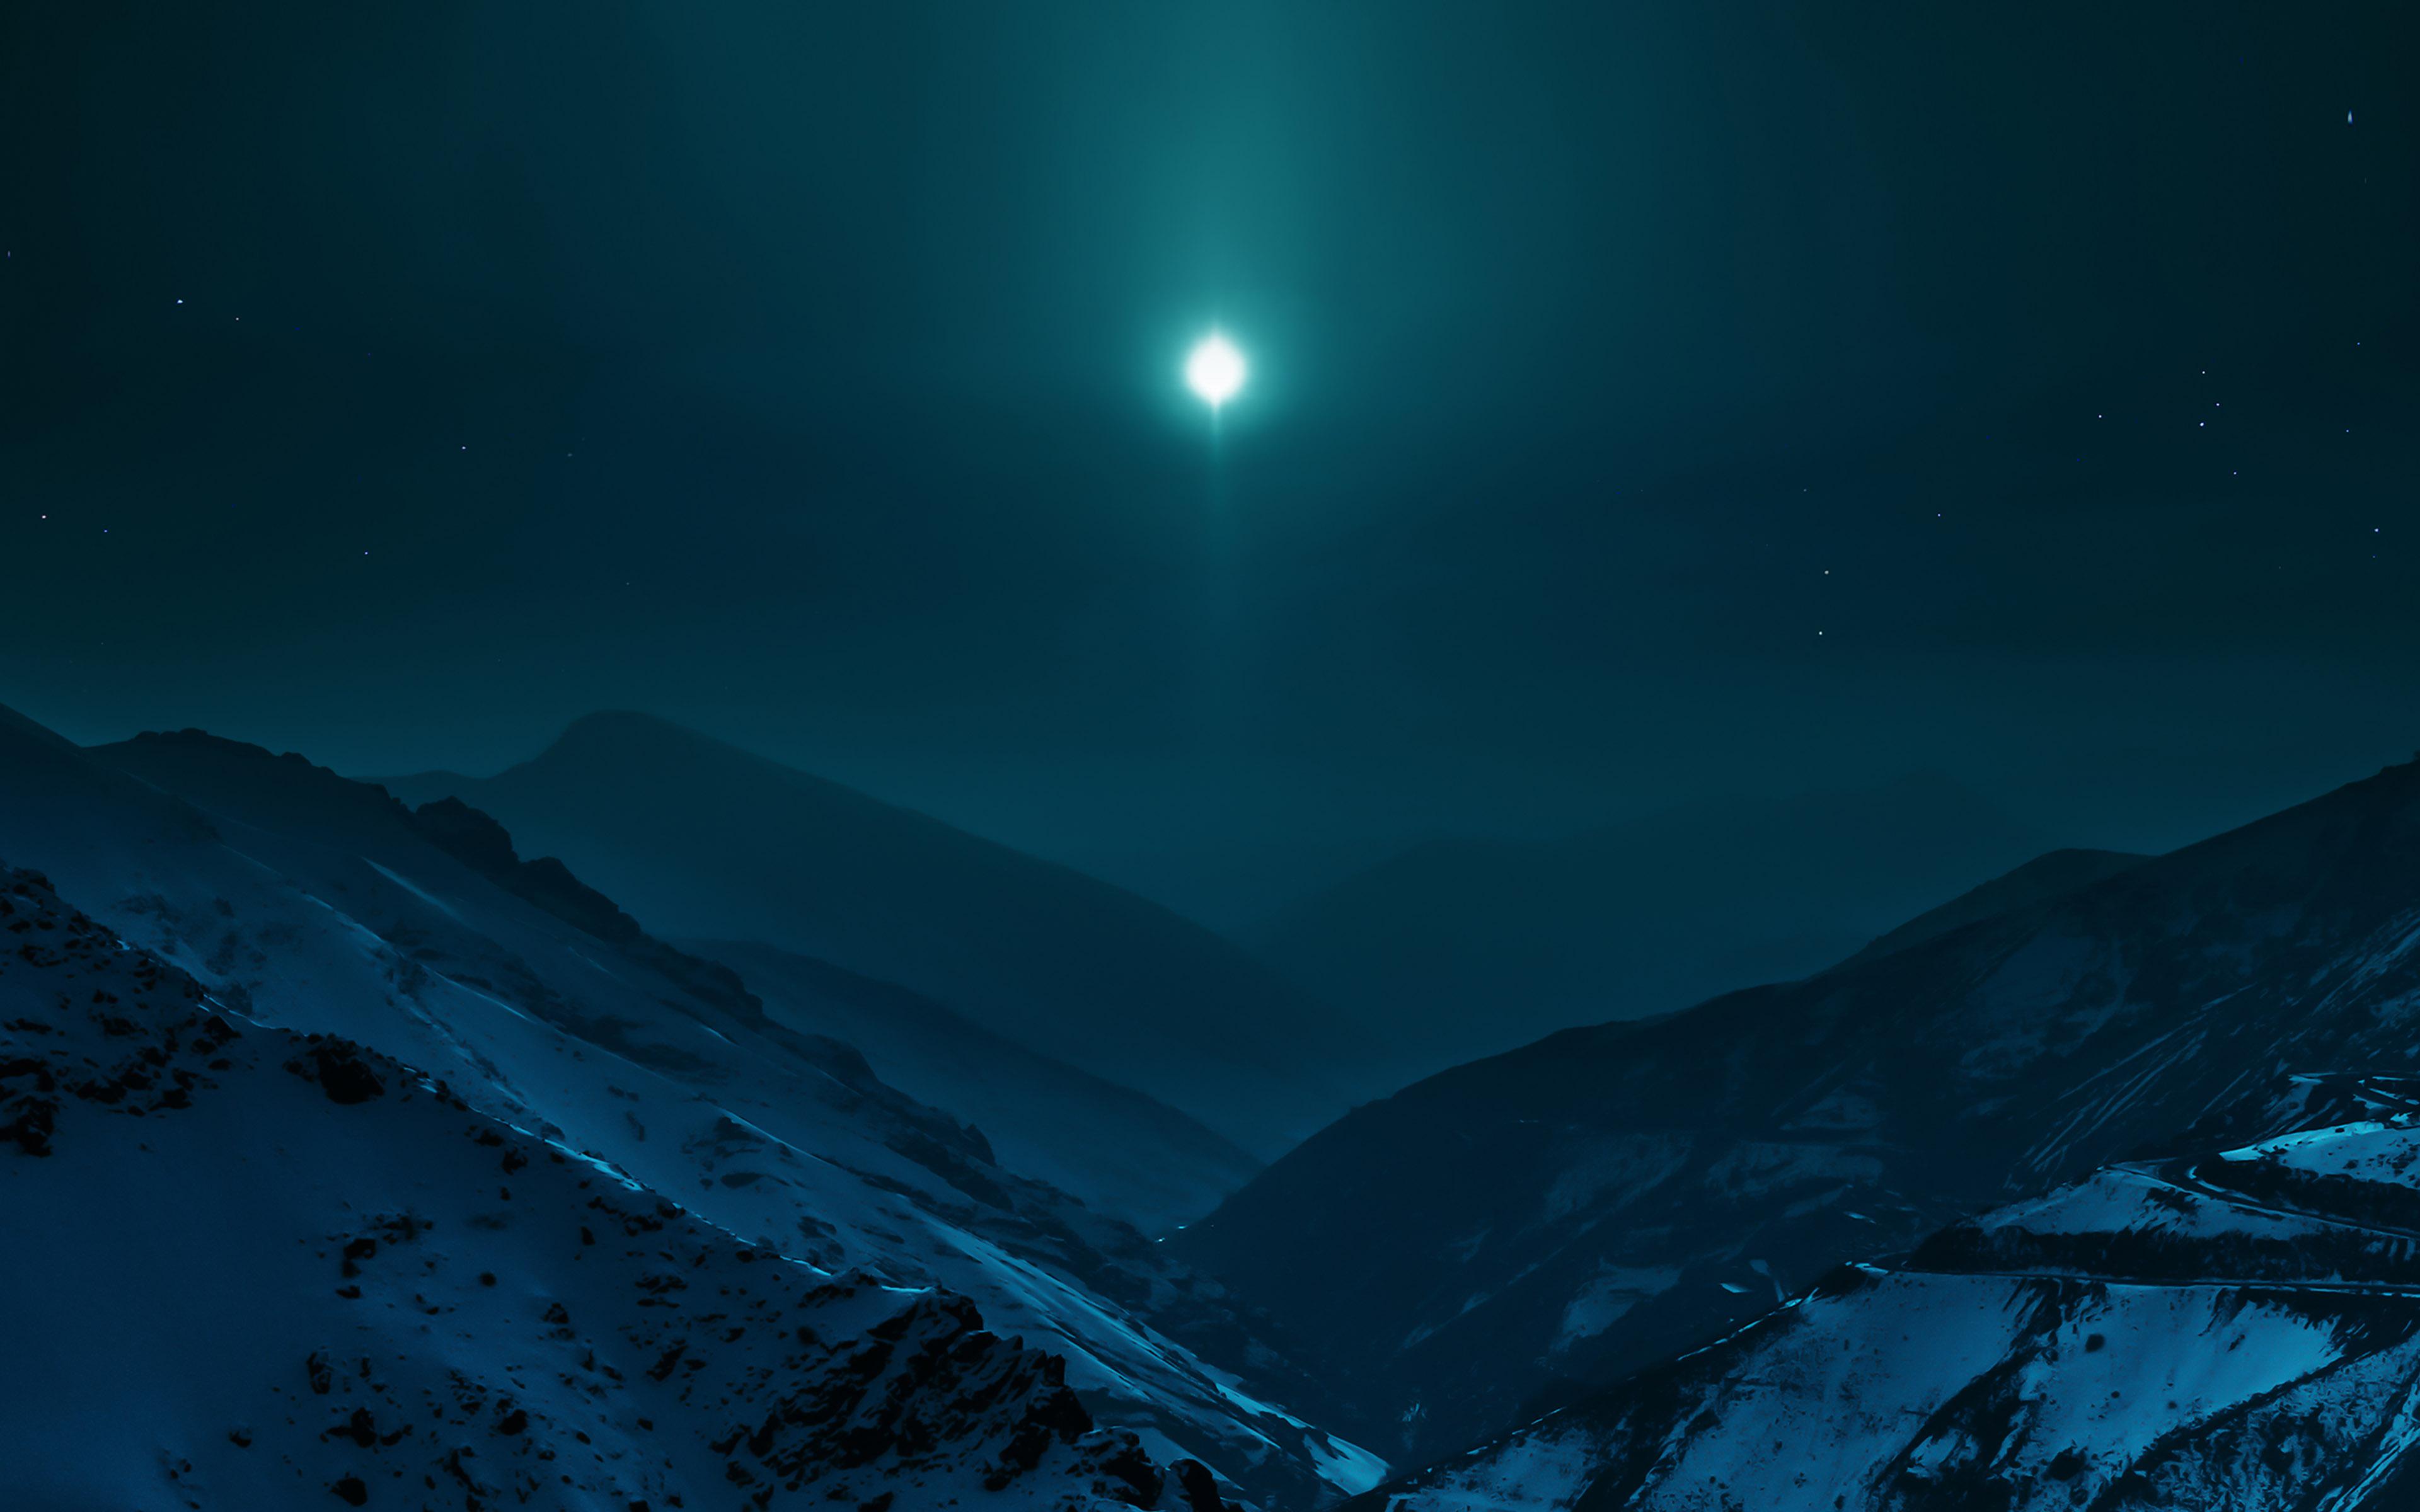 Google Images Fall Wallpaper Md47 Wallpaper Nature Earth Asleep Mountain Night Wallpaper